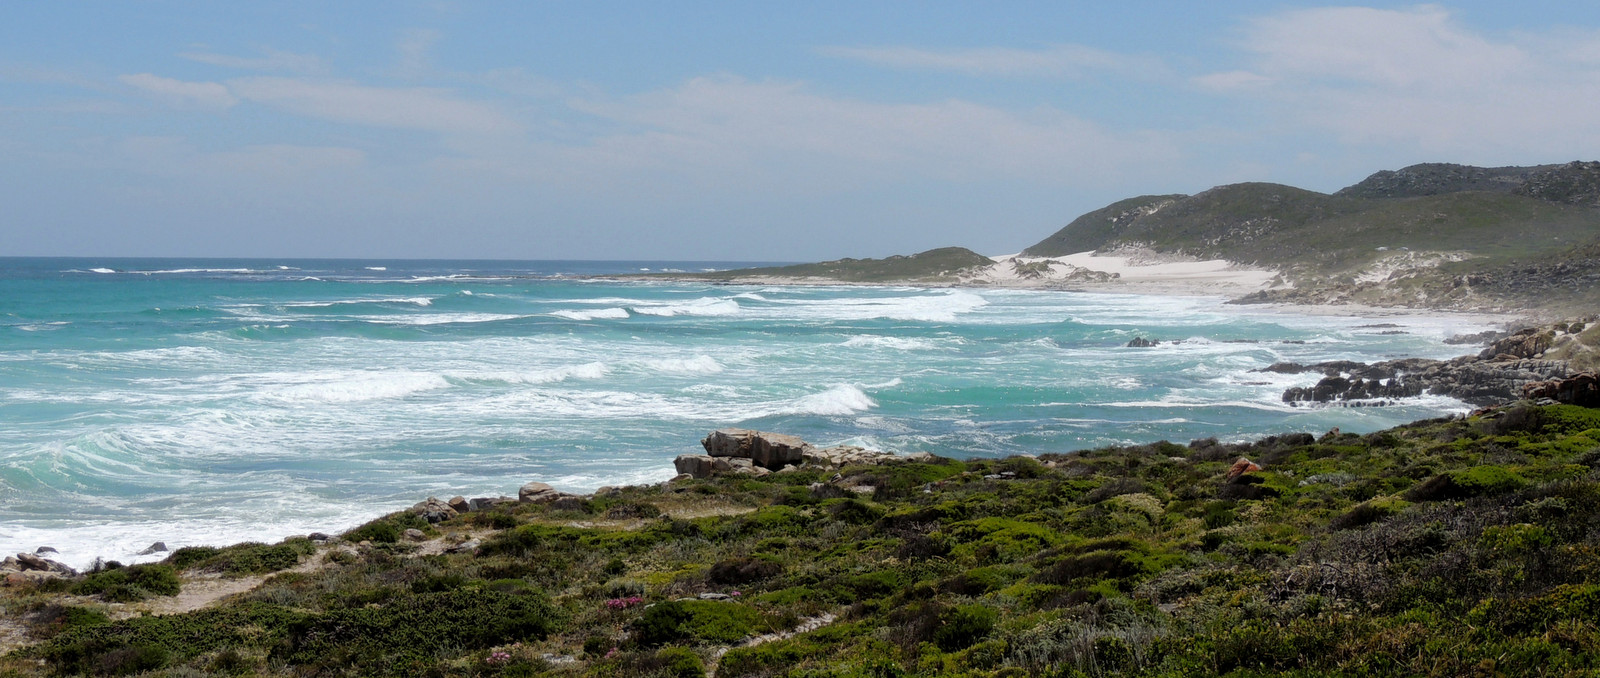 Kap - Westküste